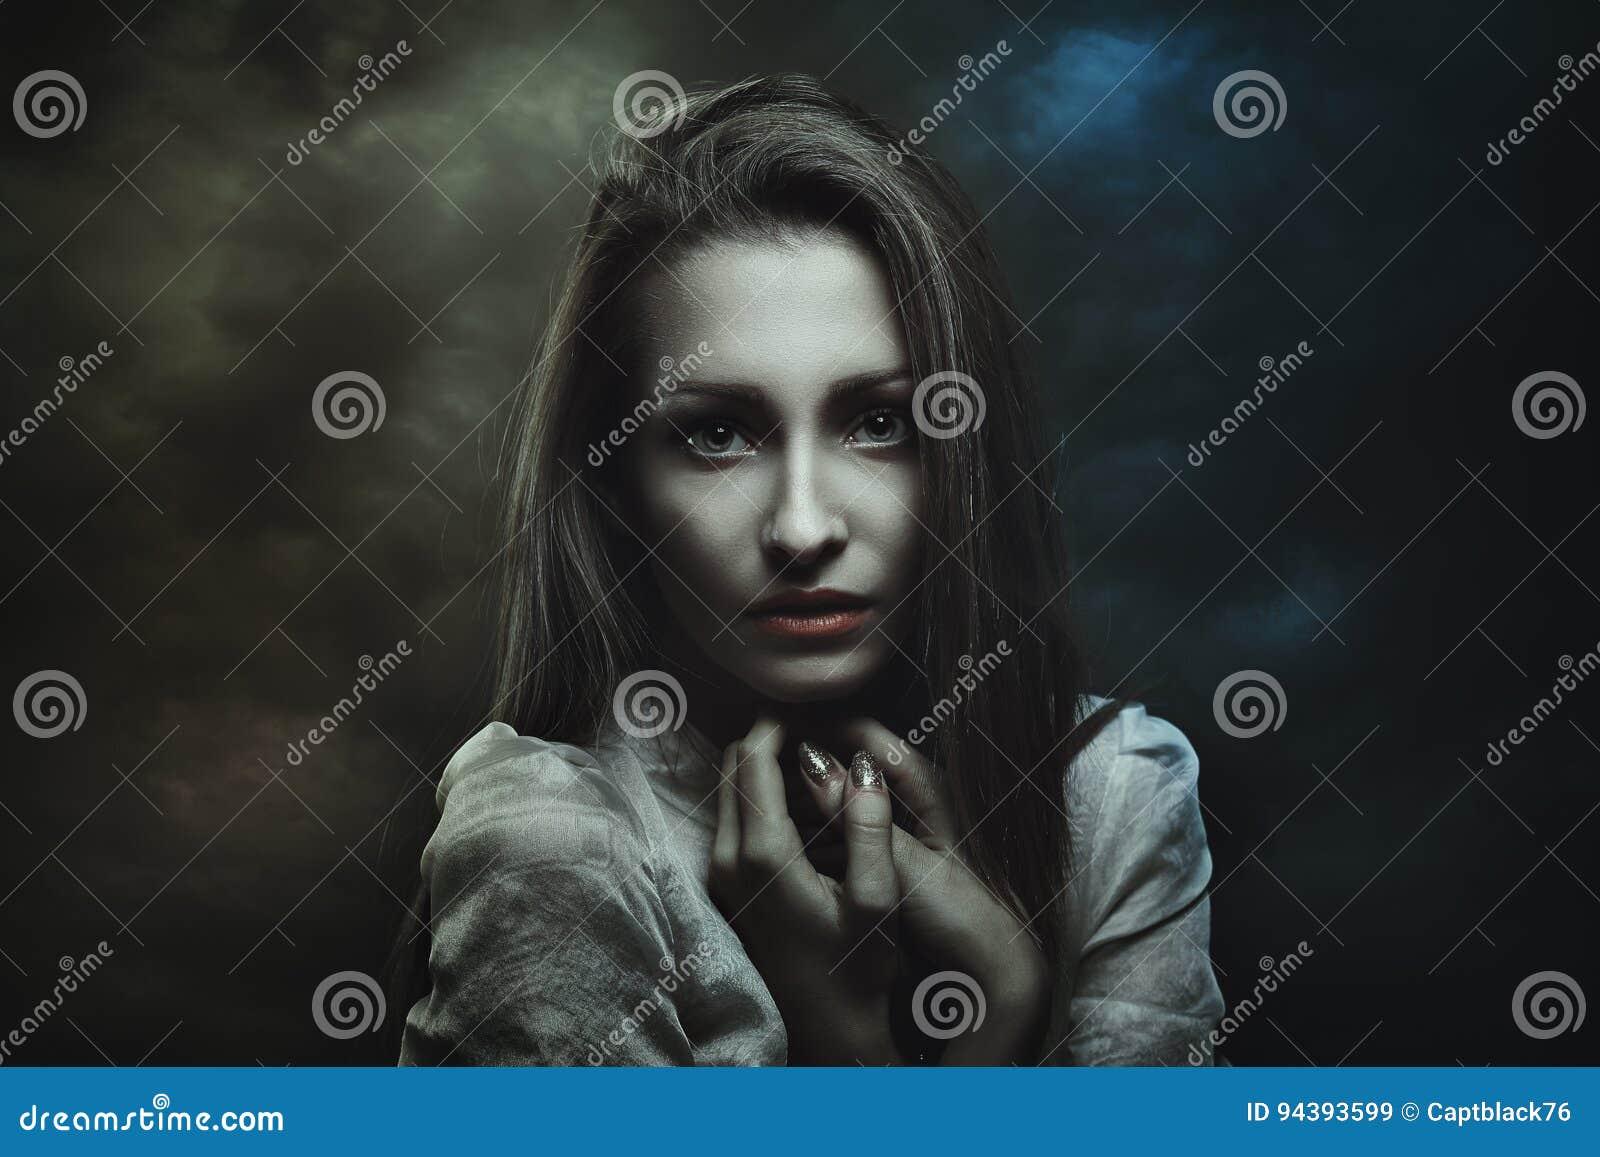 Dark portrait of mysterious woman